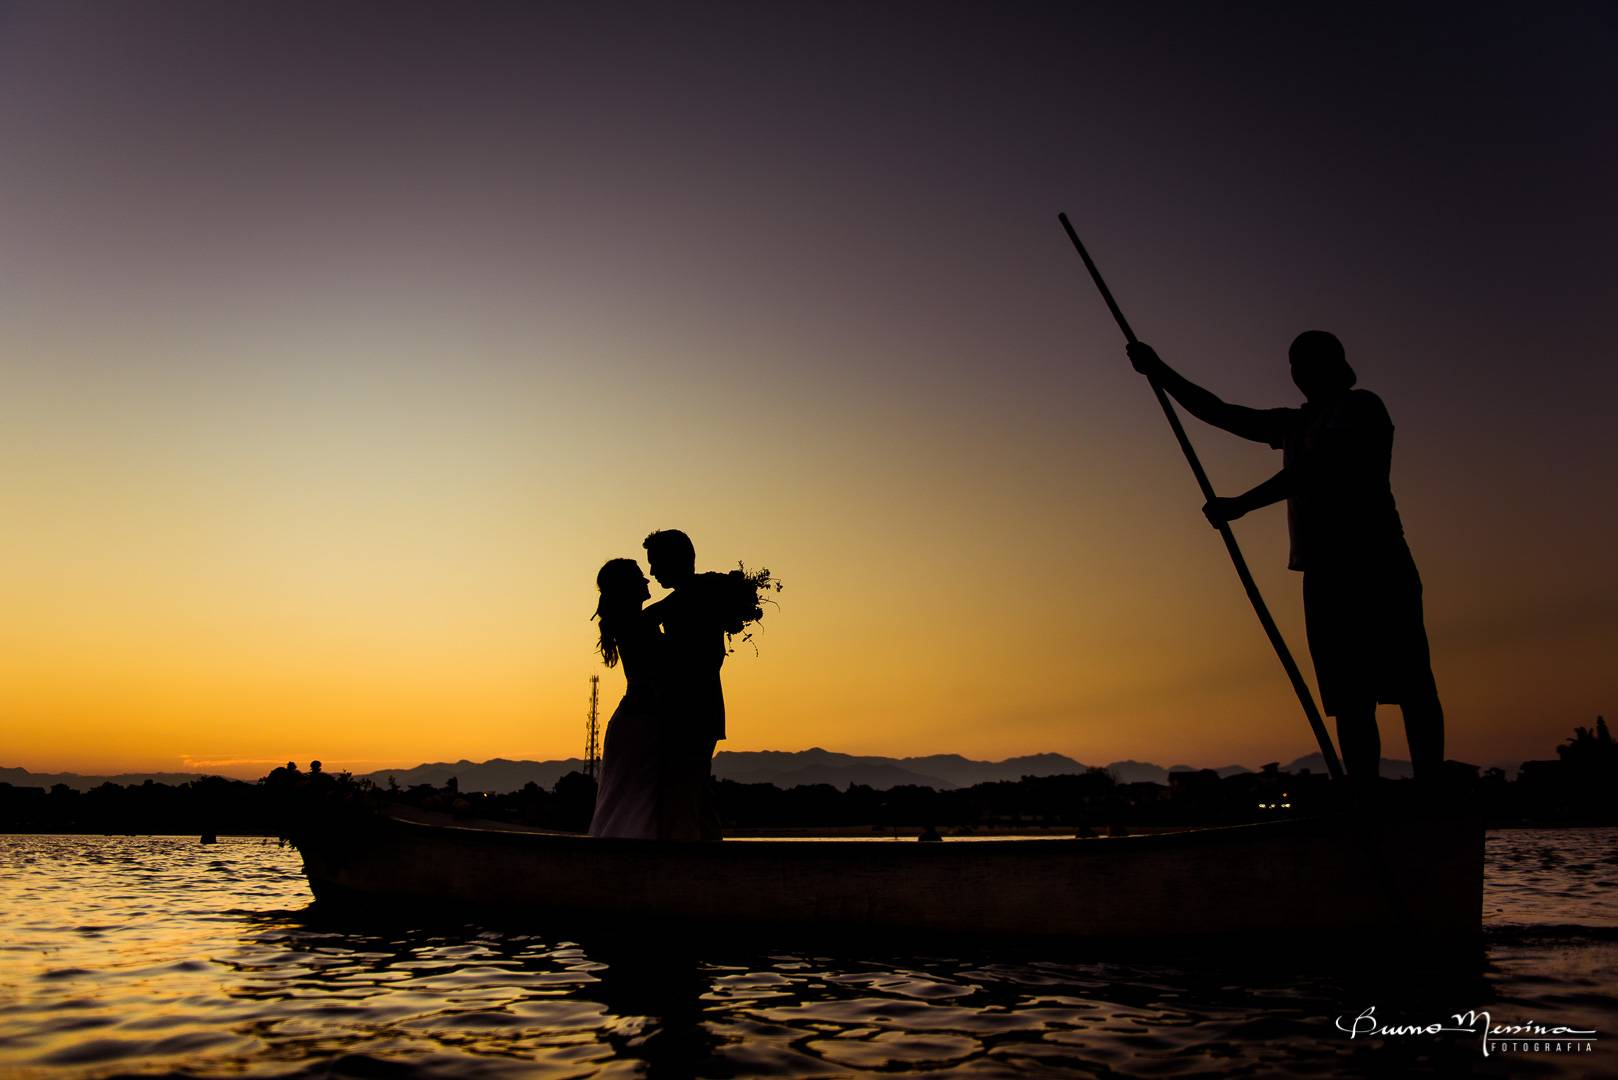 casamento-ao-ar-livre-casamento-na-praia-fotos-casamento-de-dia21